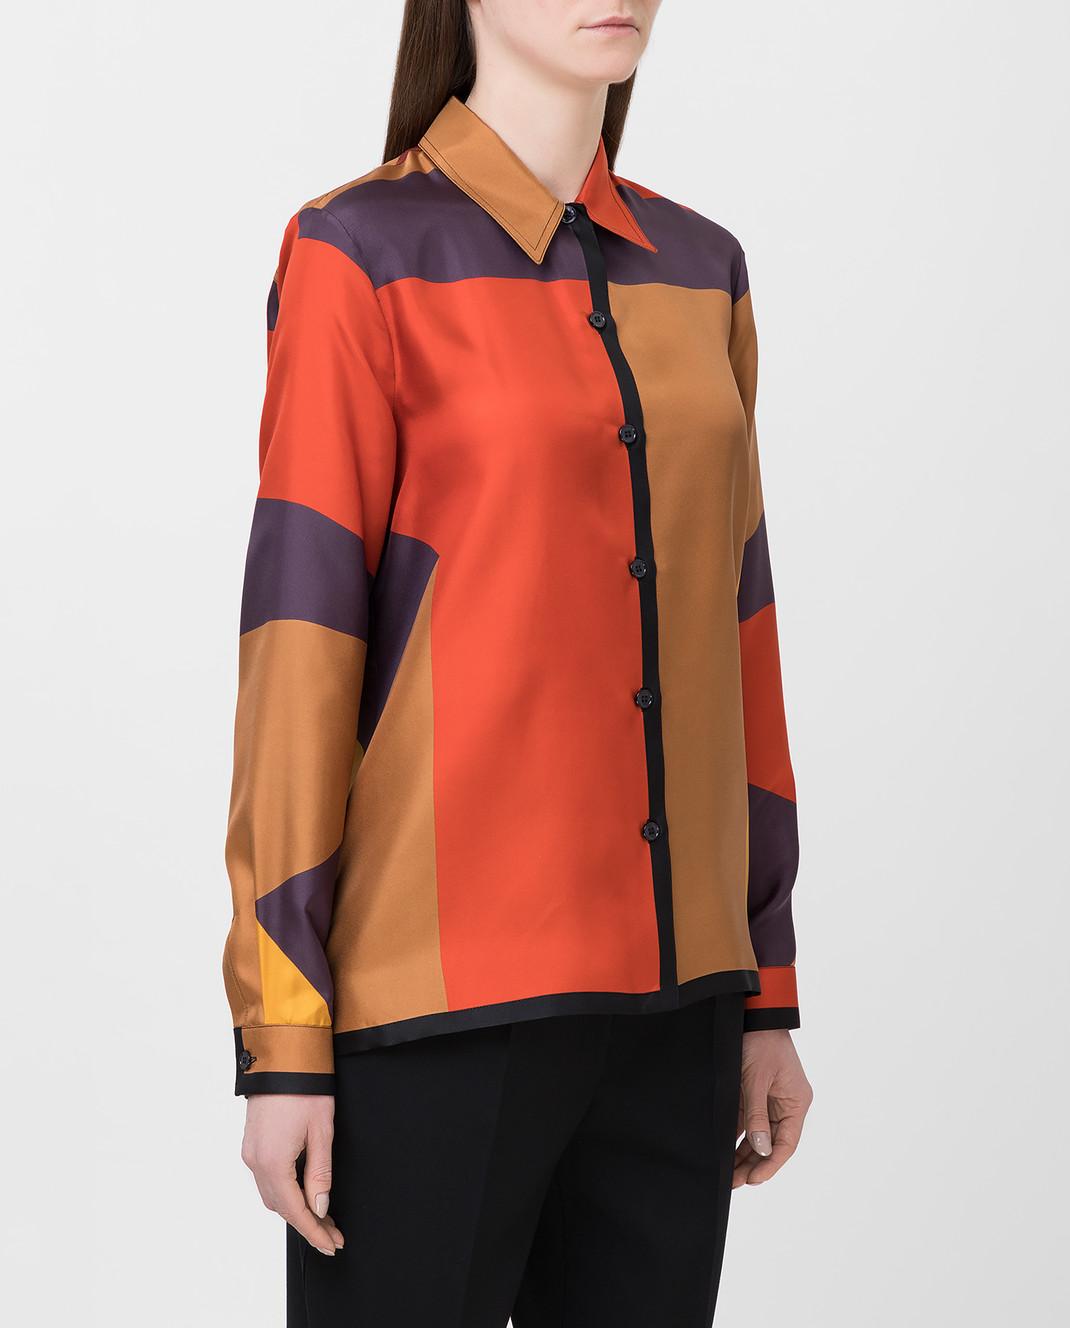 Bottega Veneta Коричневая рубашка из шелка 538599 изображение 3